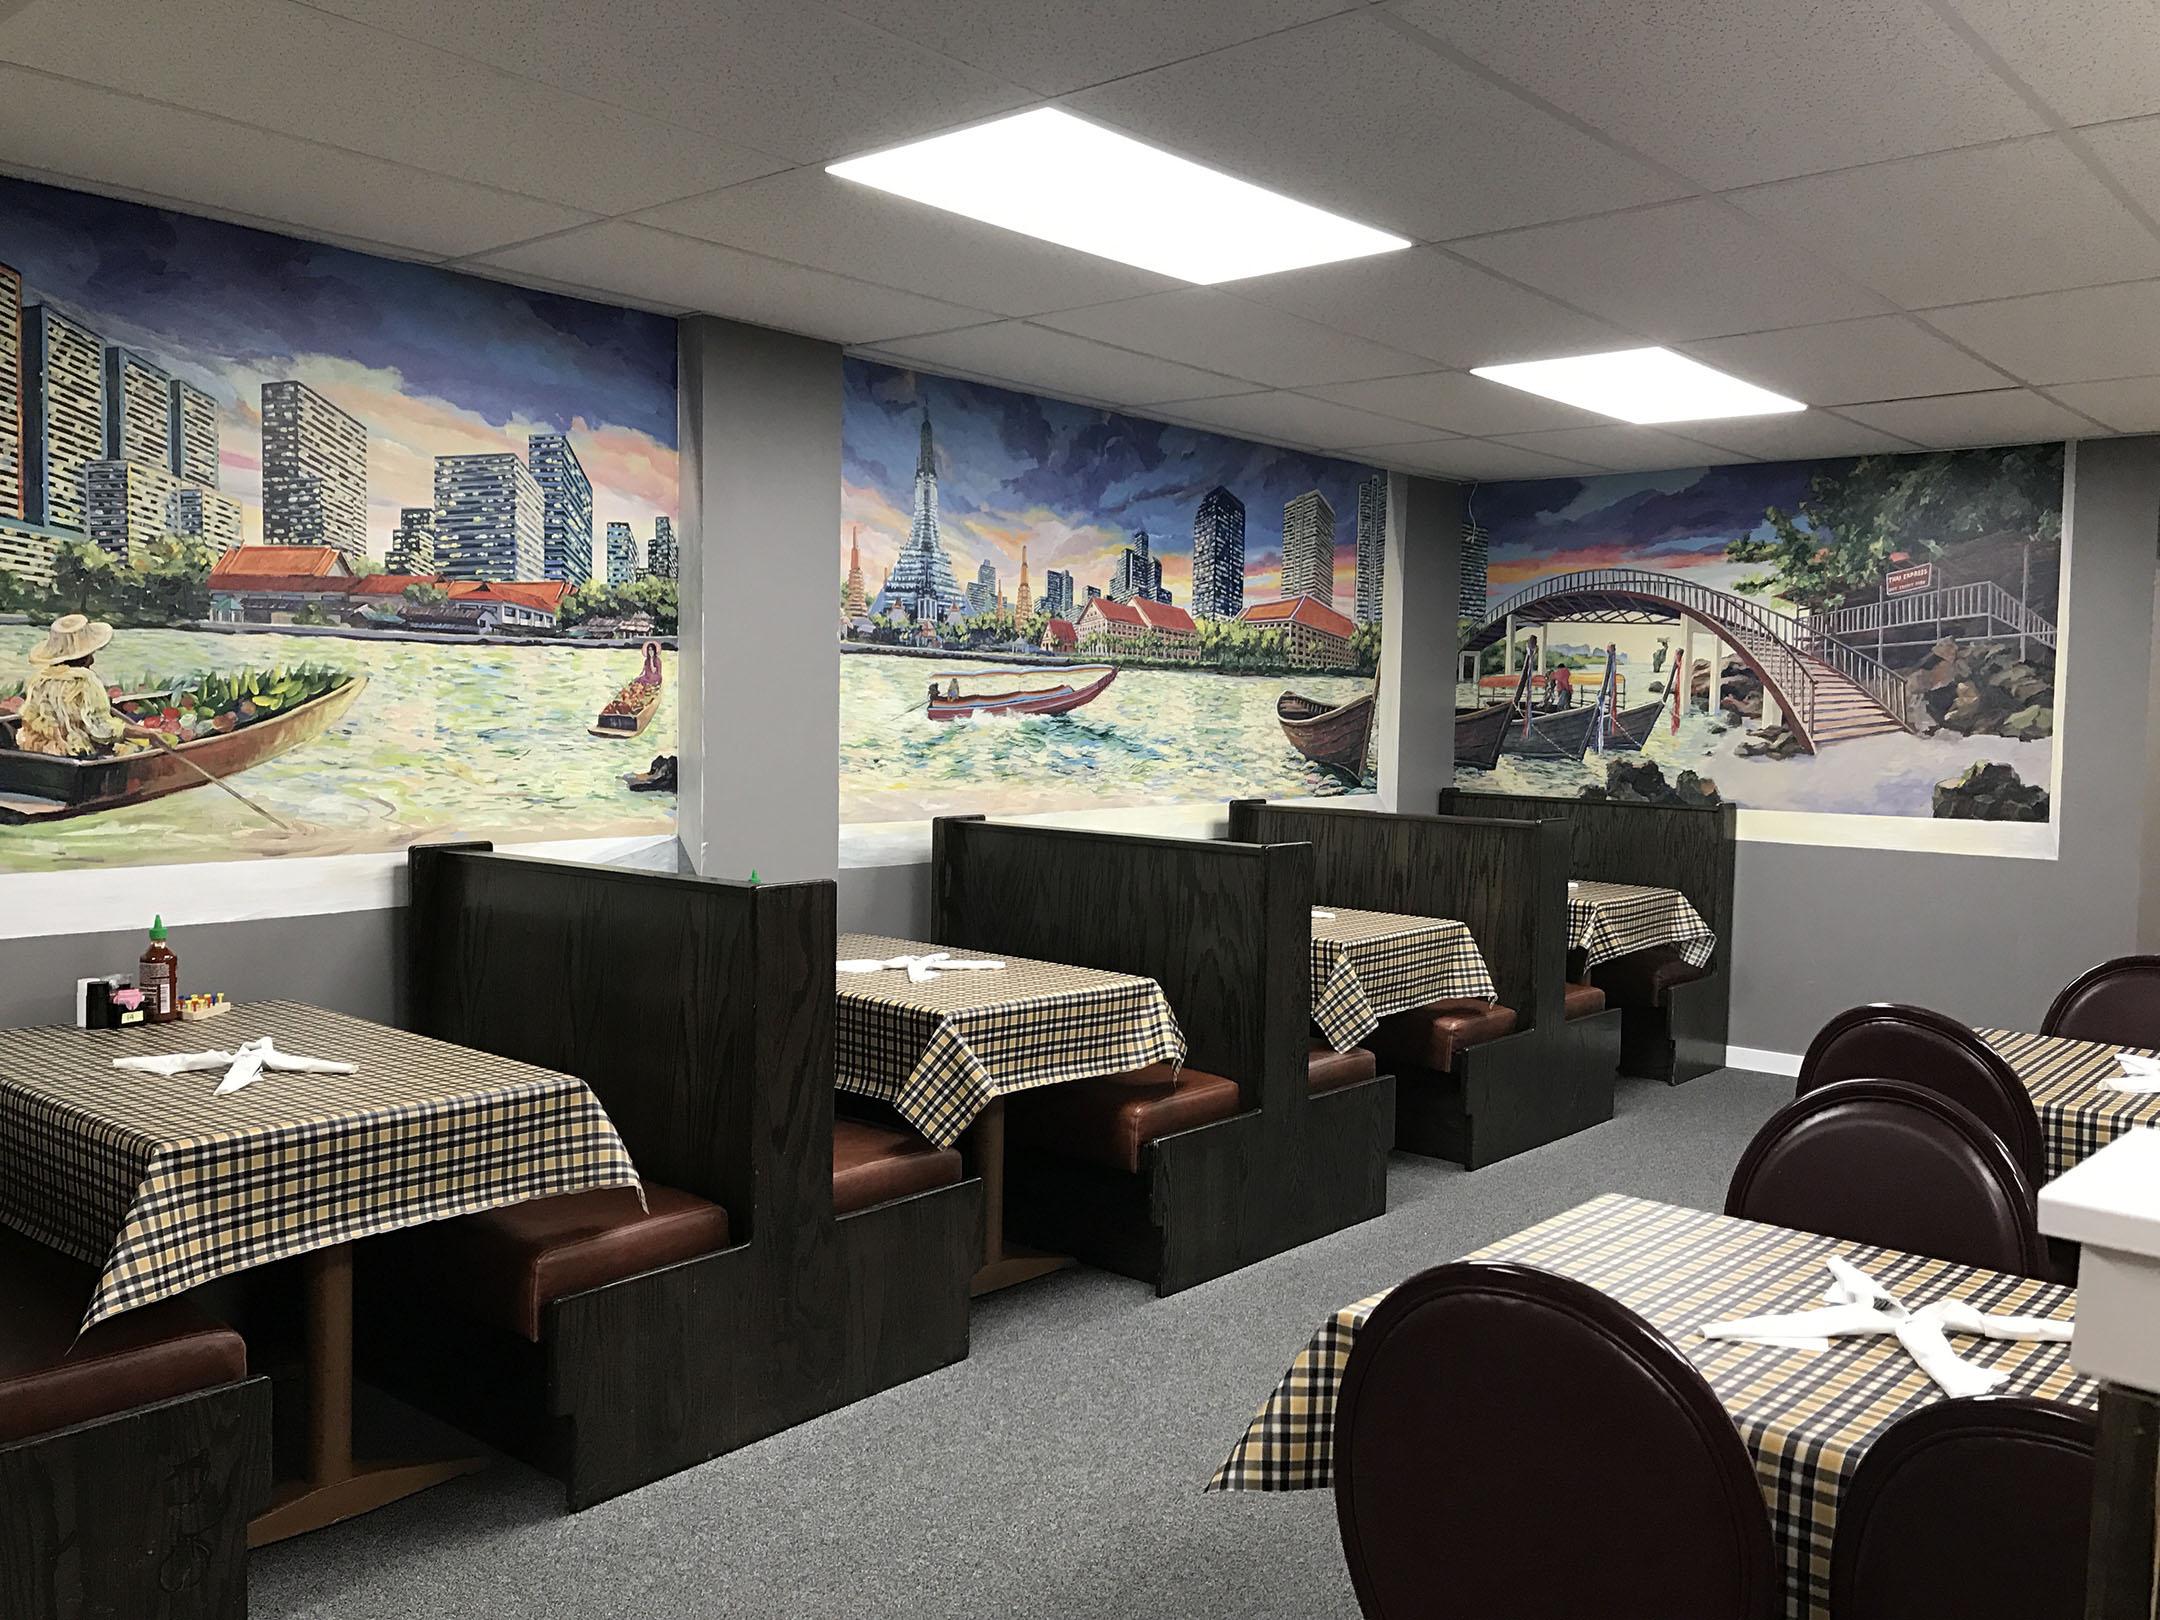 Thai Express - 4313 Kalamazoo Ave SE, Grand Rapids, MI